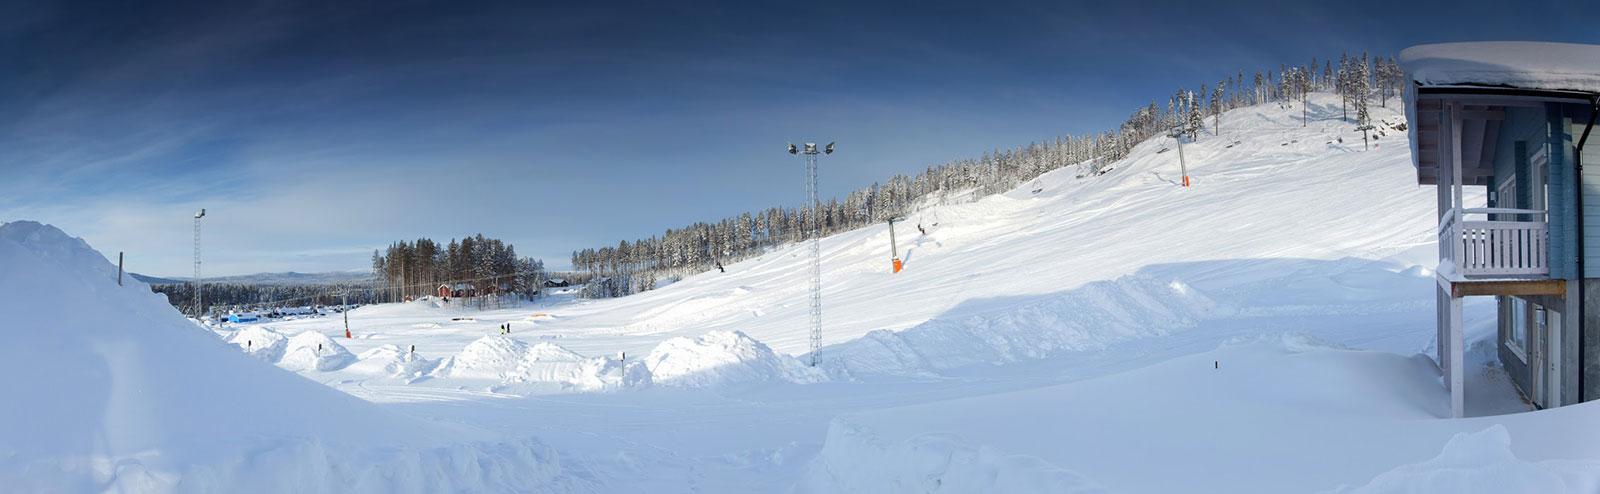 Blafjell-Panorama3.jpg